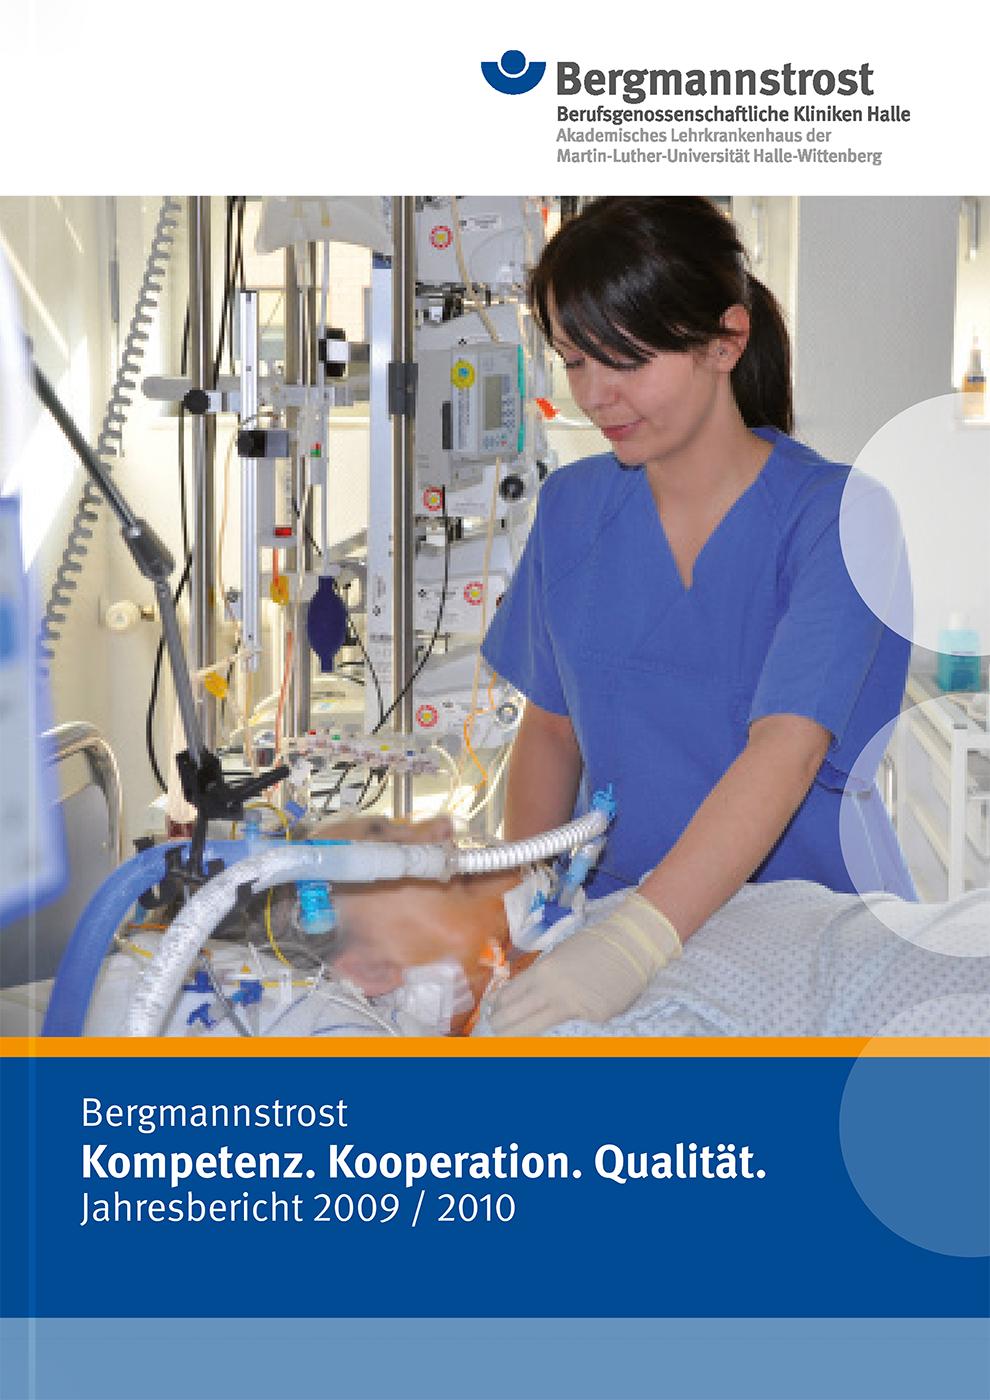 BG Jahresbericht 2009 / 2010